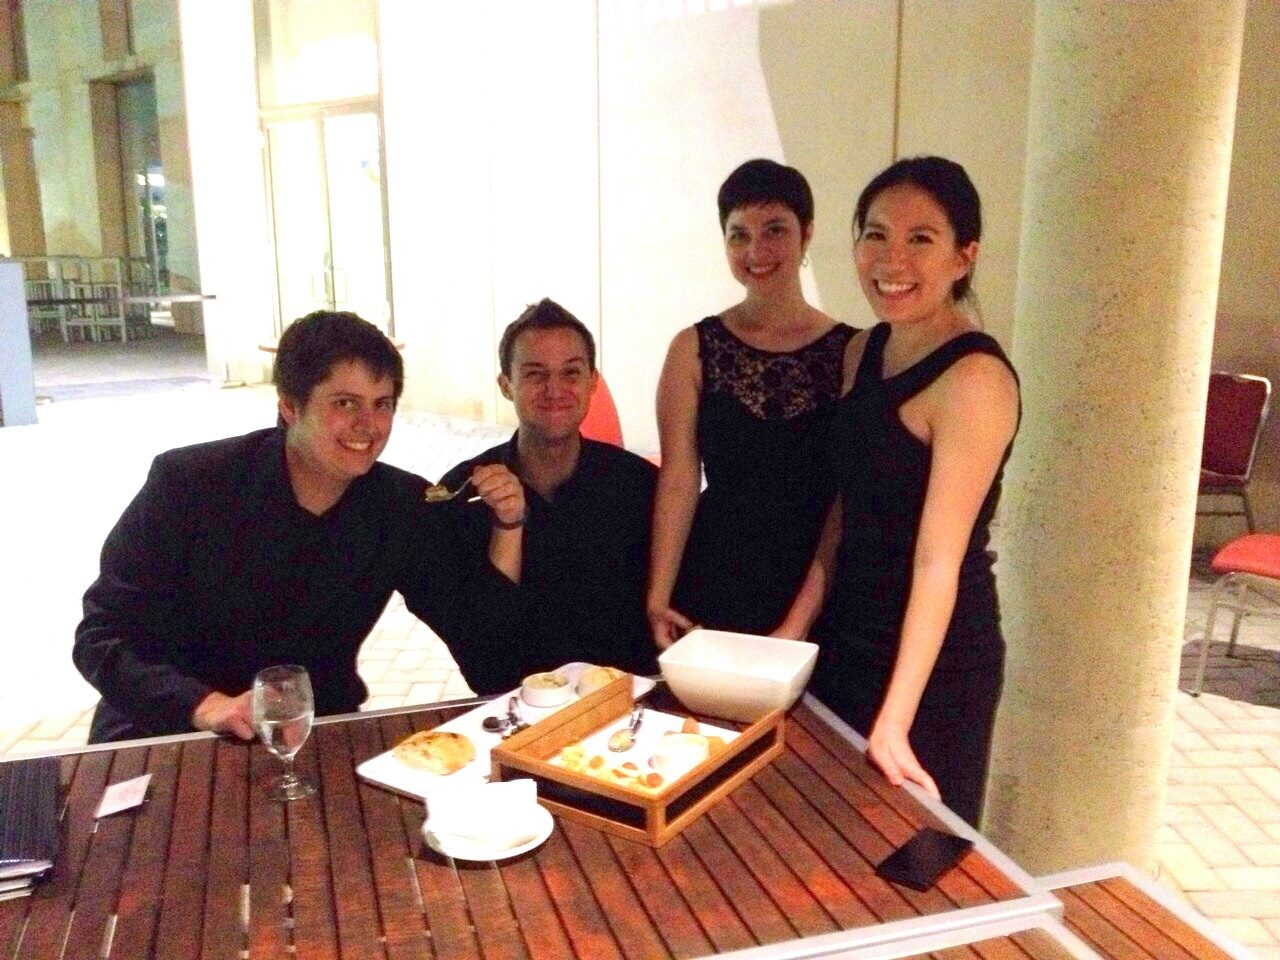 The String Quartet enjoyed some delicious canapes afterwards! L-R: David, Stuart, Cristina and Jennifer.